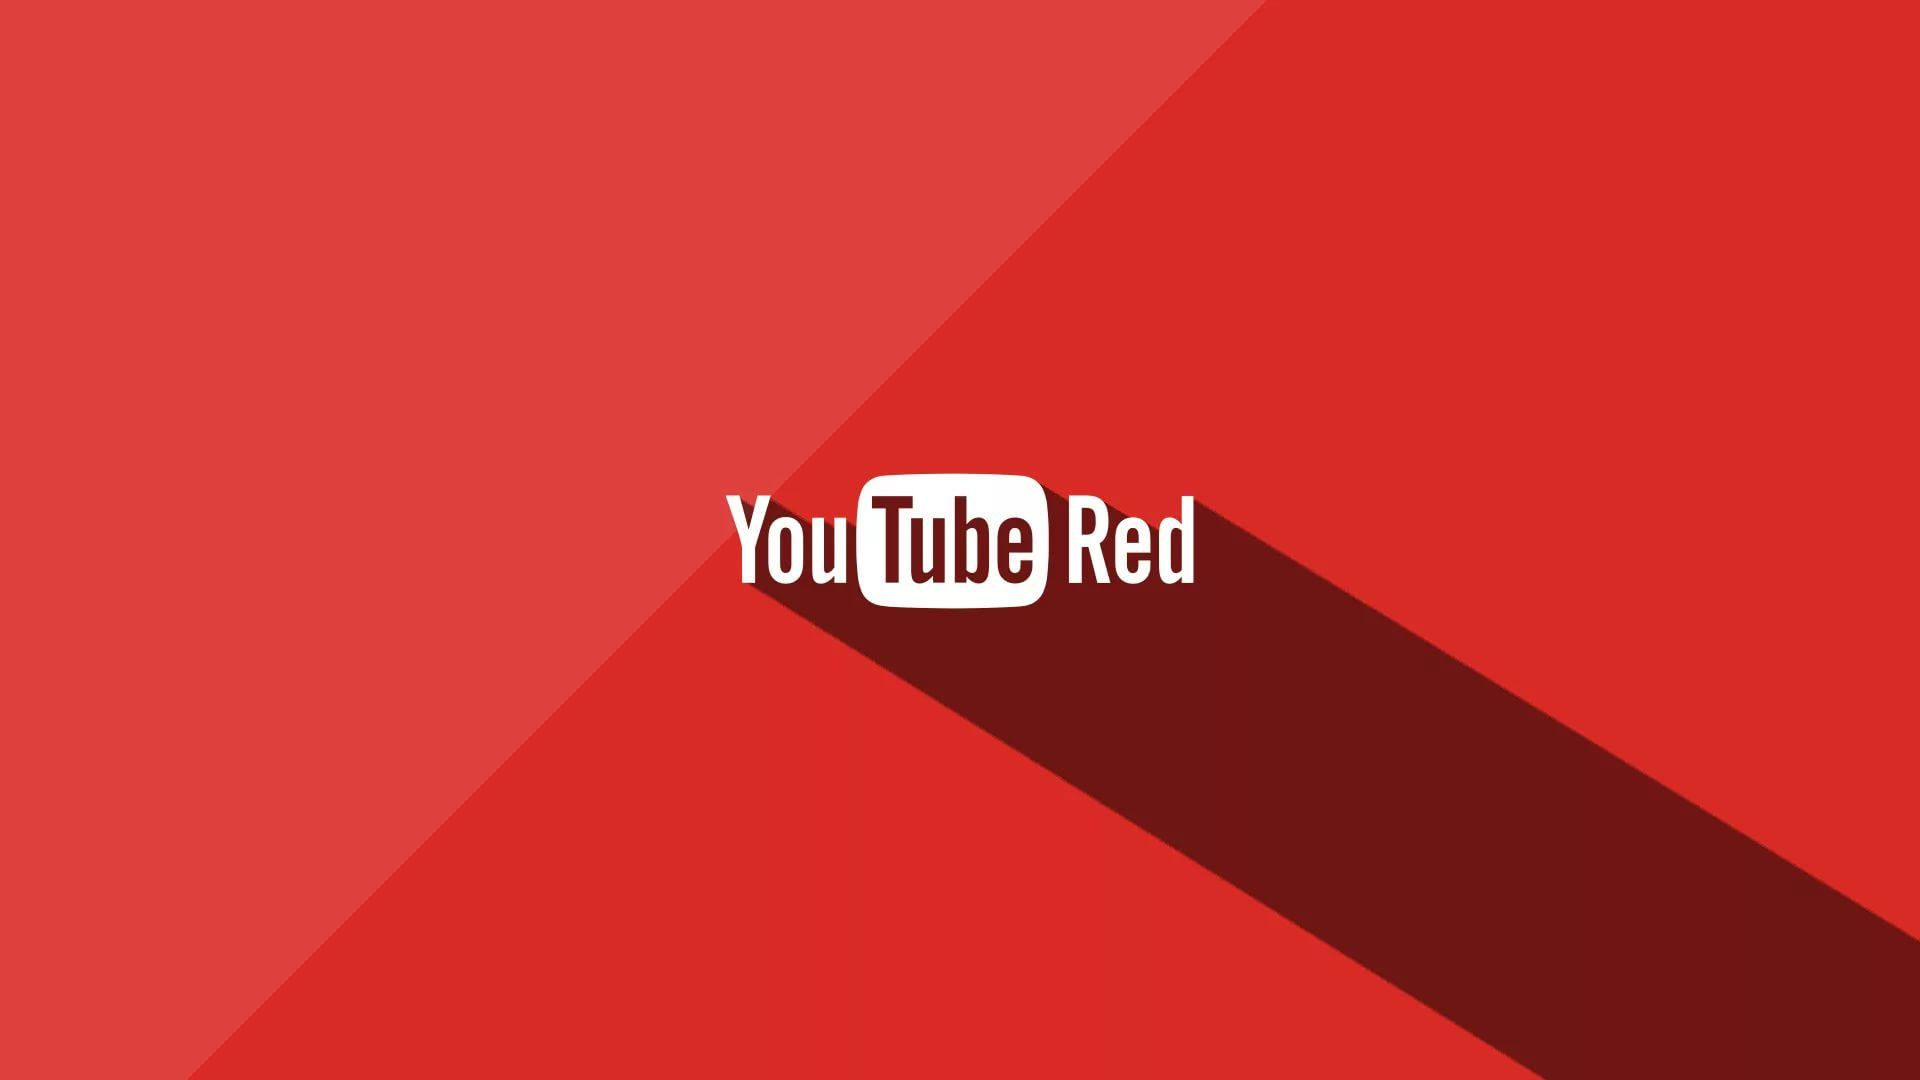 Youtube new wallpaper